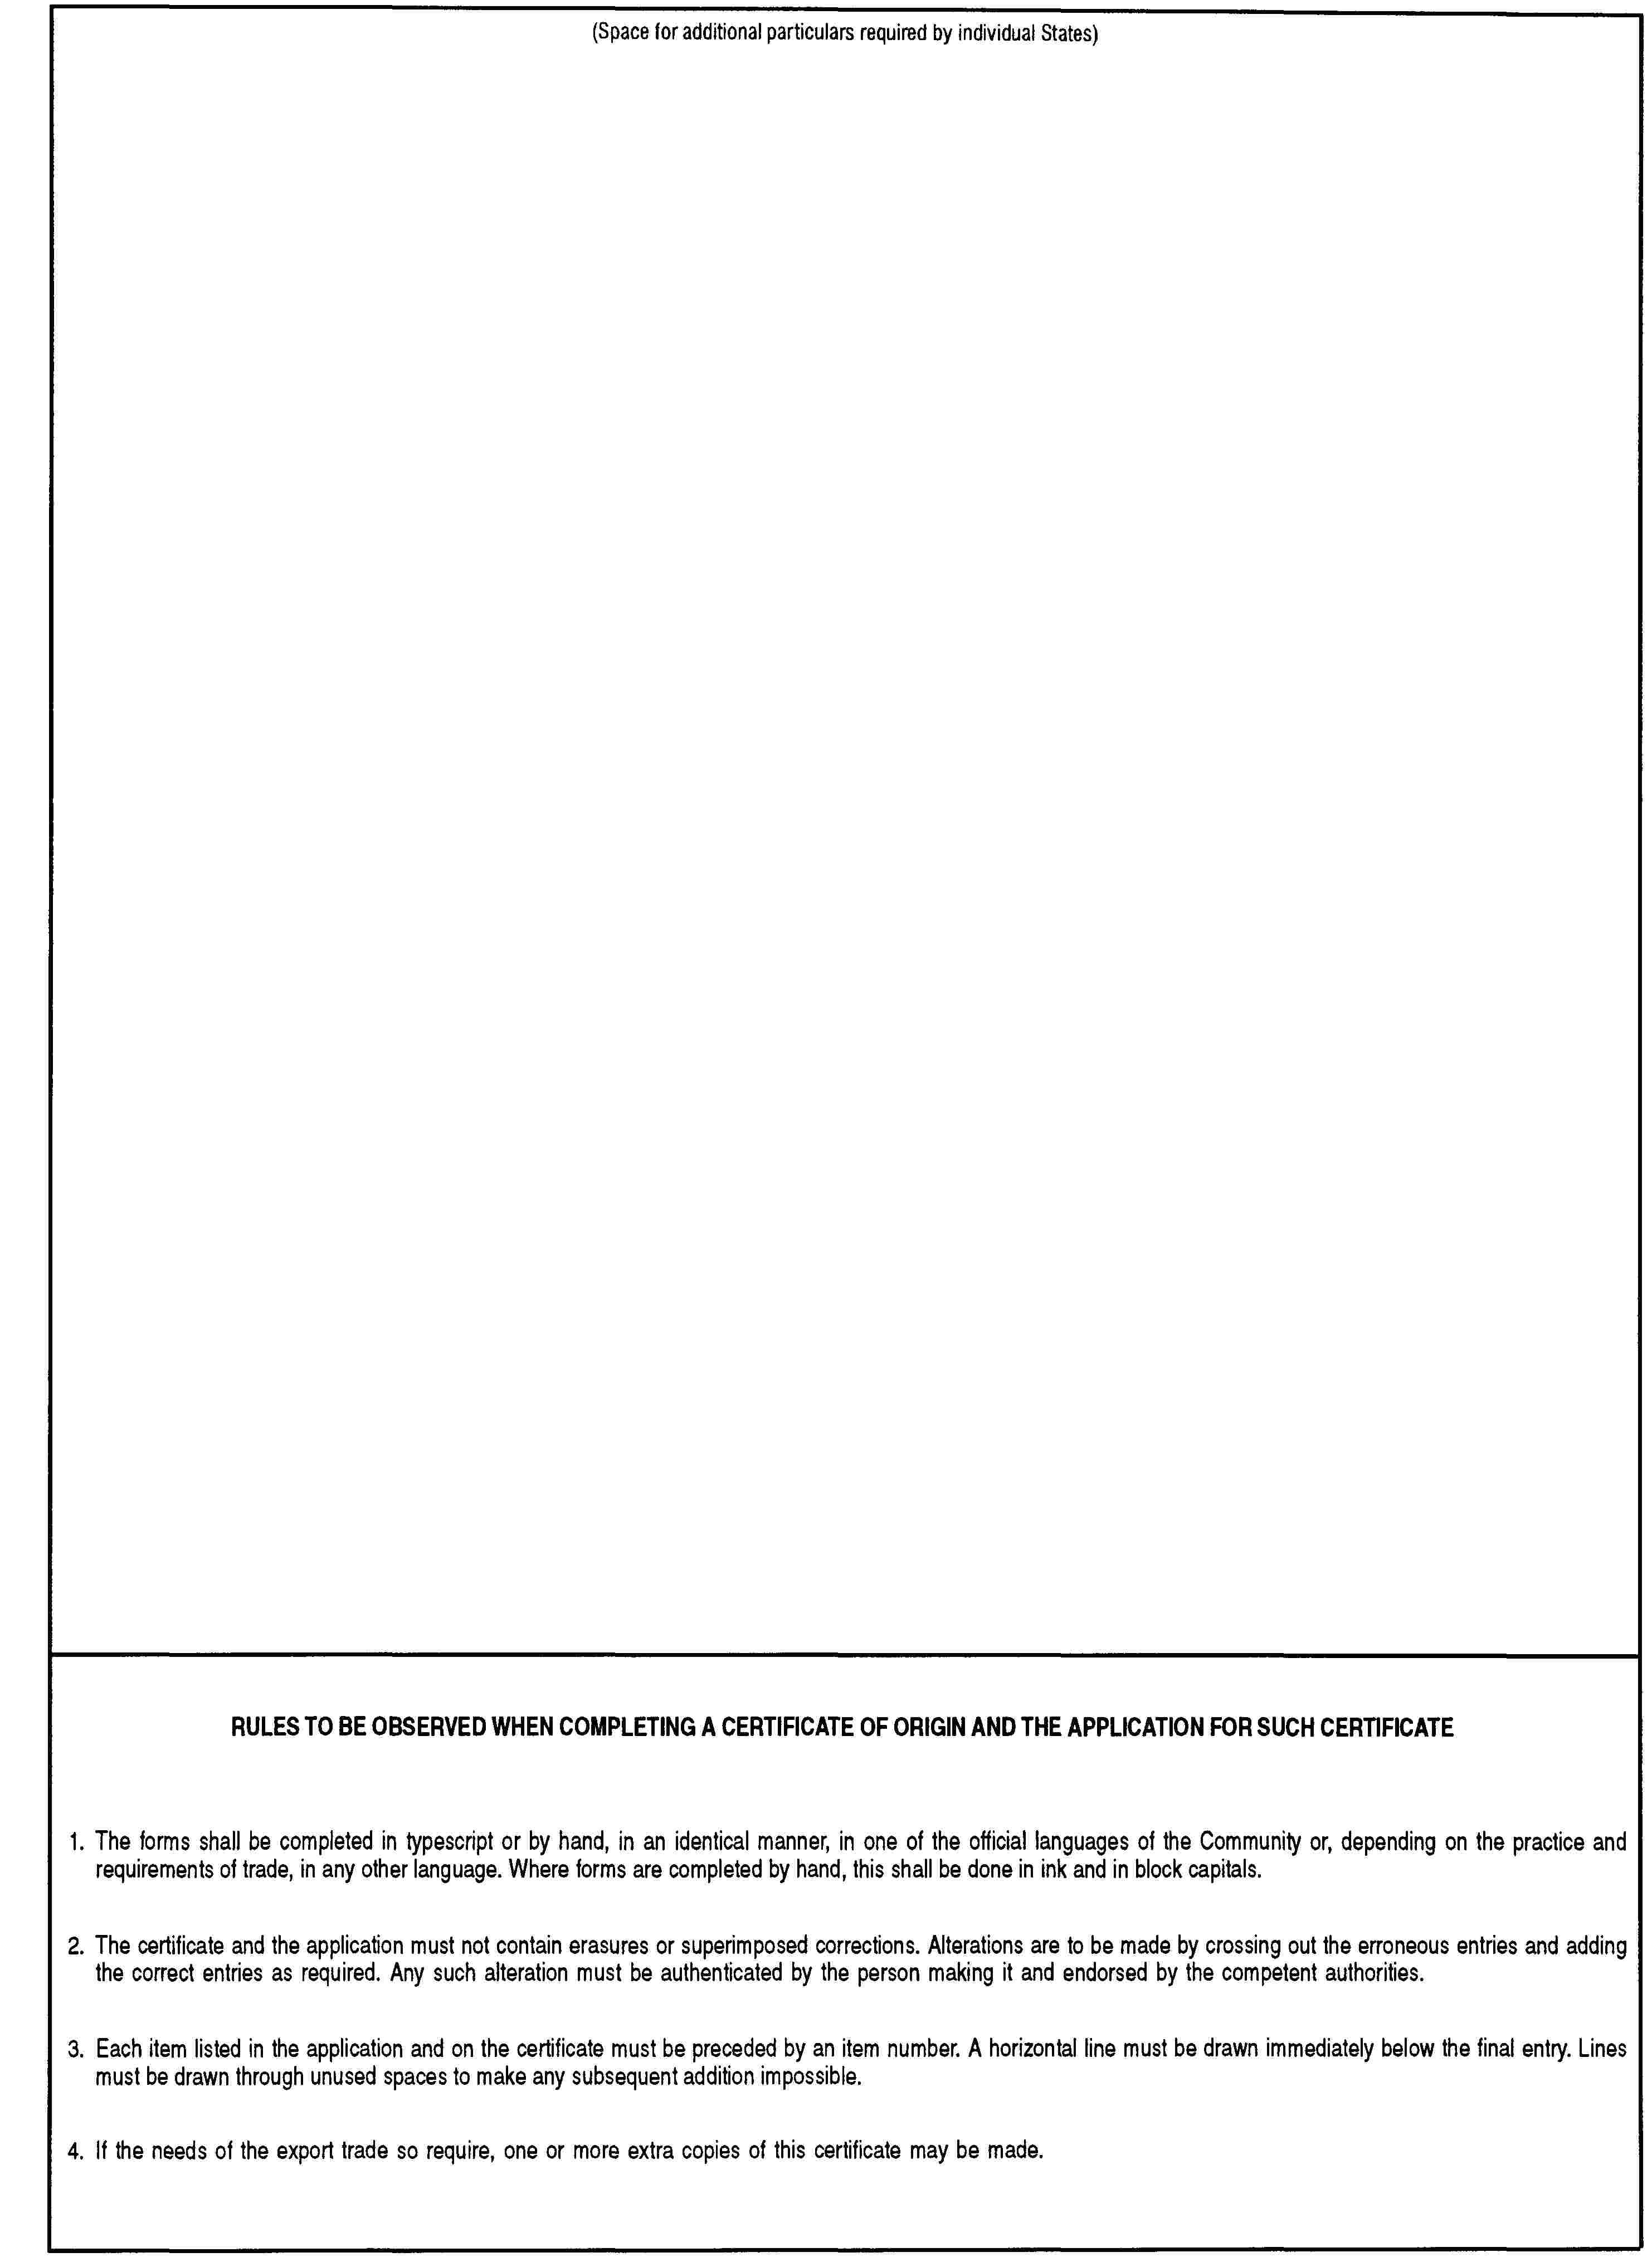 eur lex 01993r2454 20060101 en eur lex